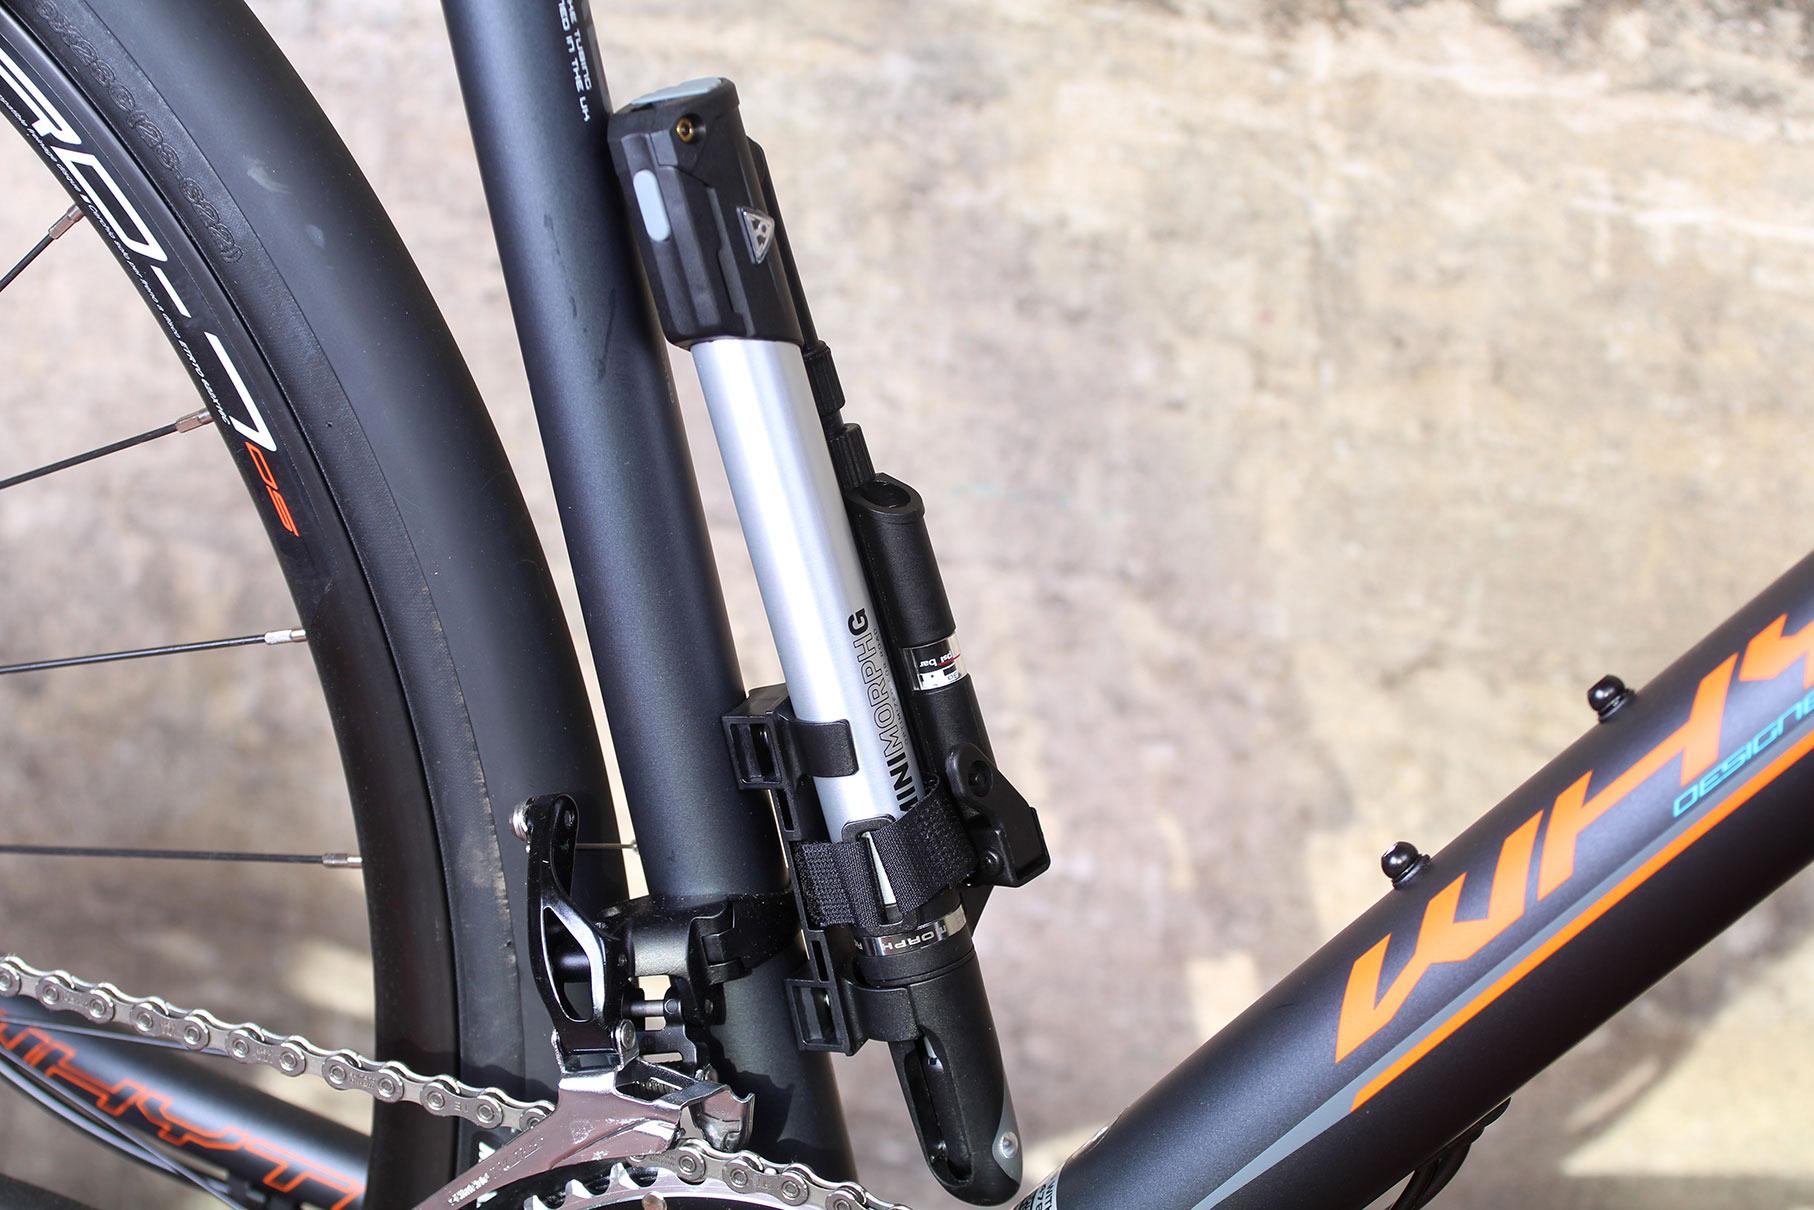 Topeak Mountain Morph Compact Bike Pump